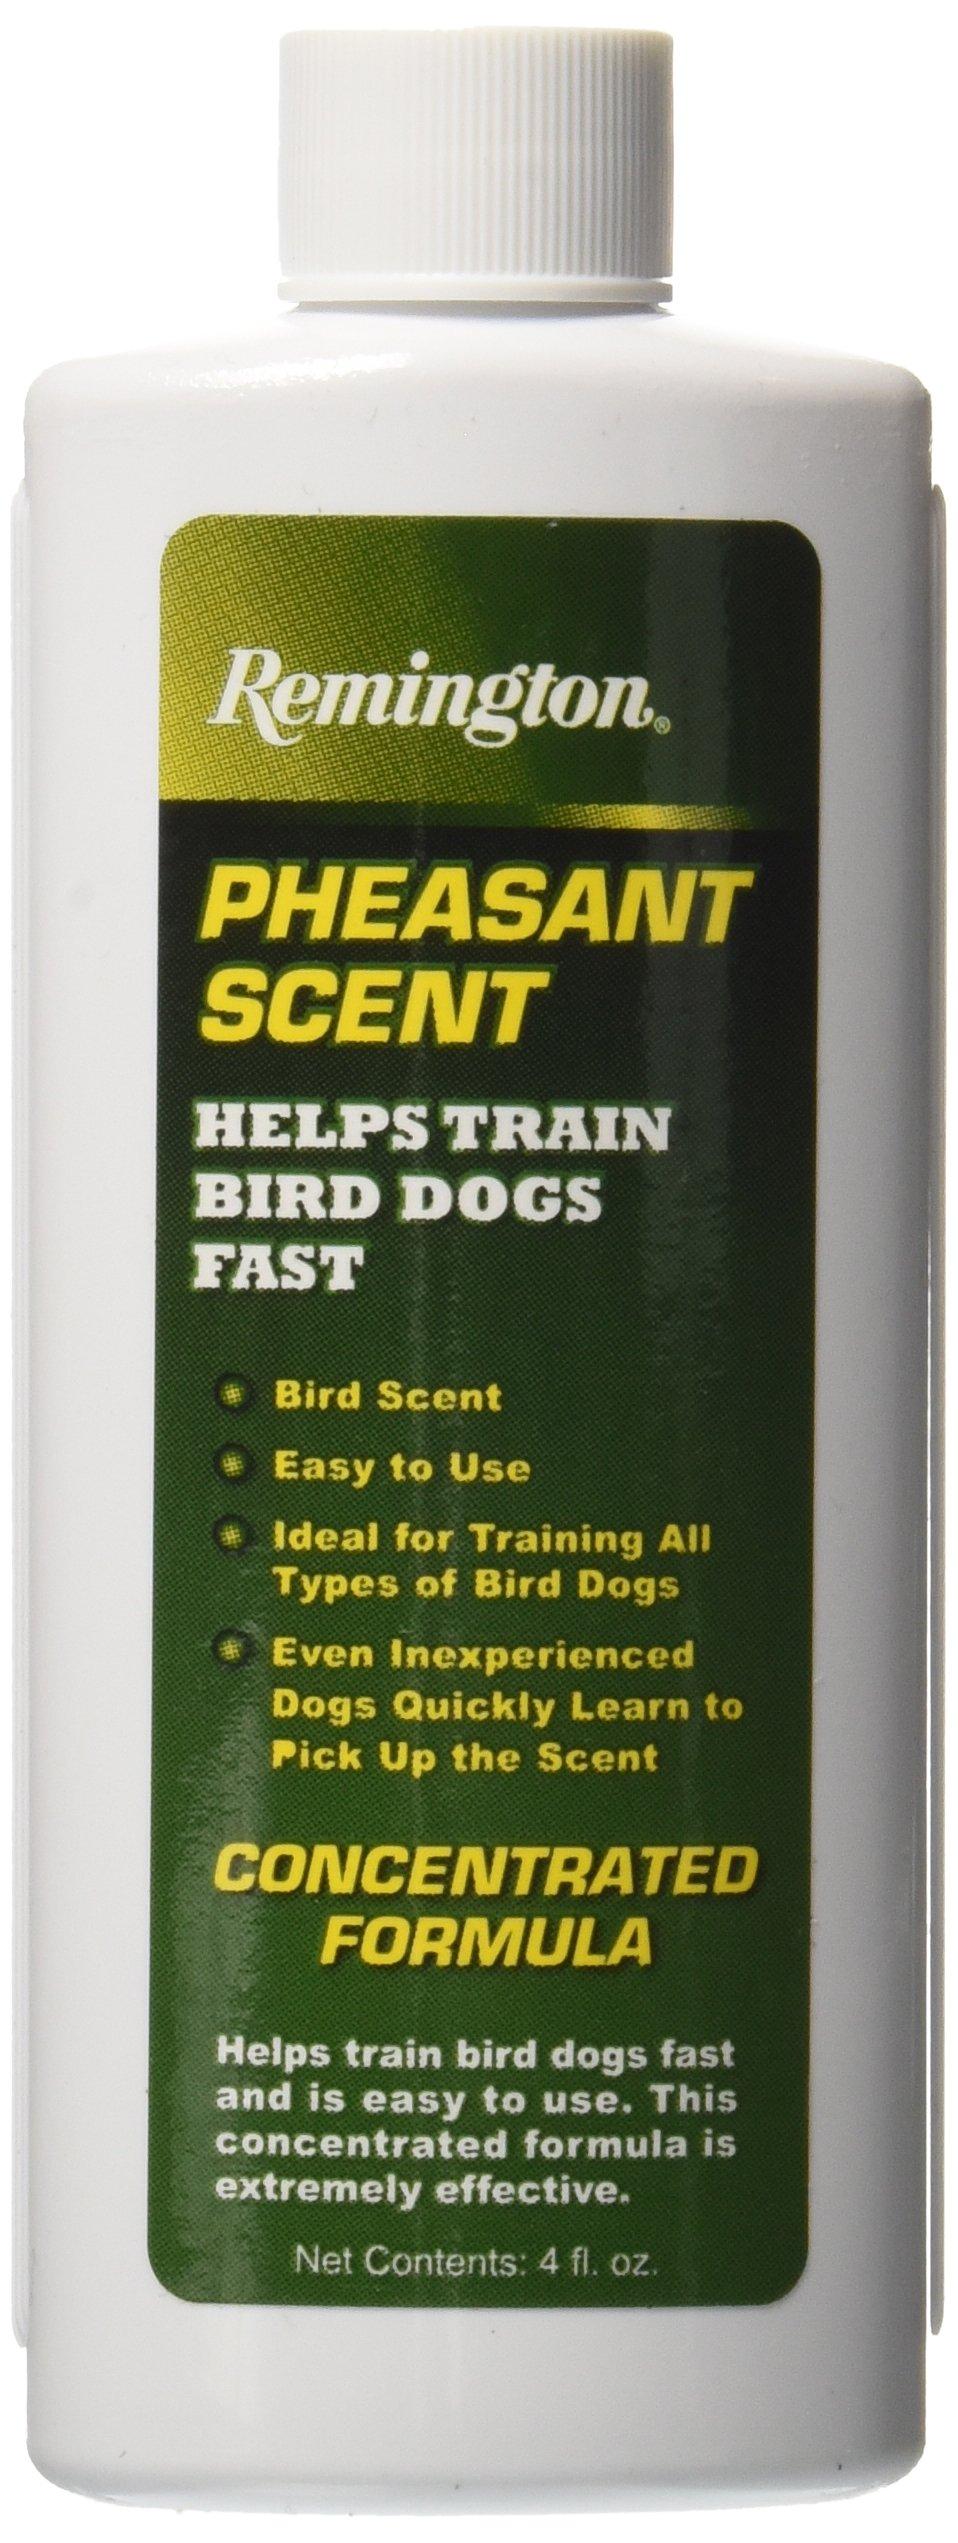 Coastal Pet R1850 PHE04 Pheasant Training Scent, 4-Ounce by Coastal Pet